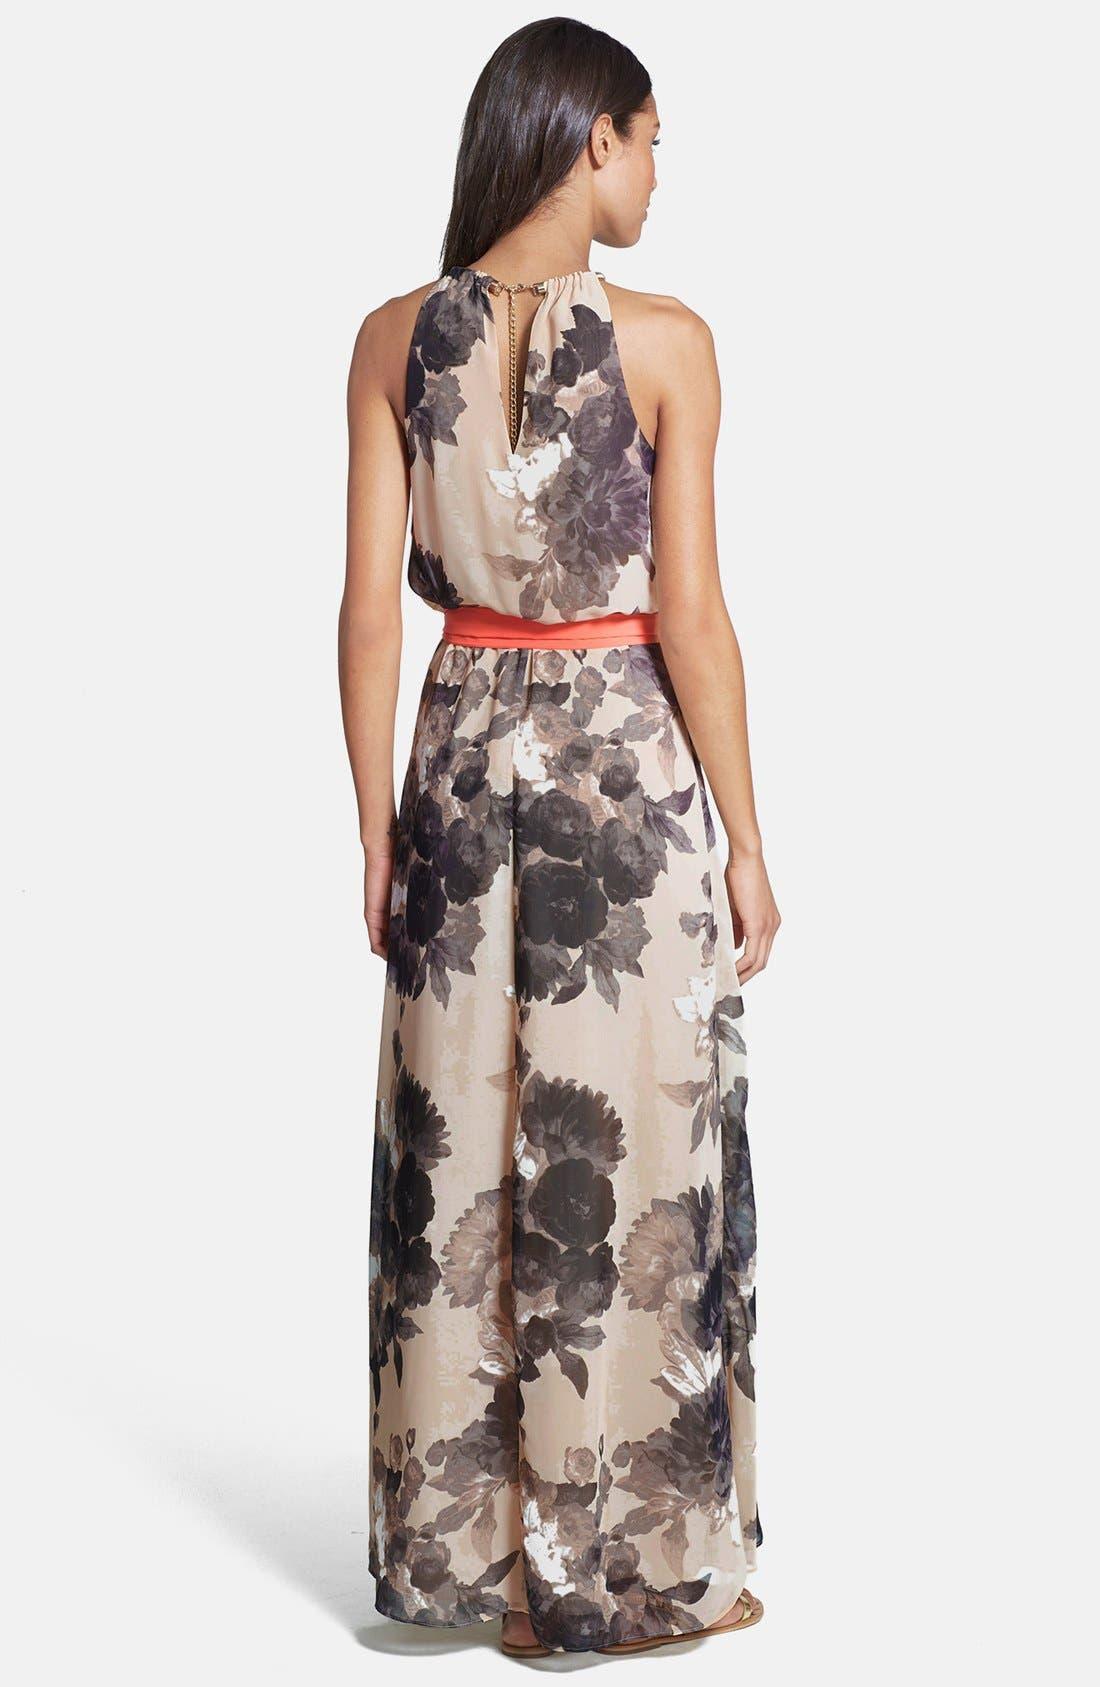 Floral Print Chiffon Maxi Dress,                             Alternate thumbnail 10, color,                             TAUPE/ BLACK